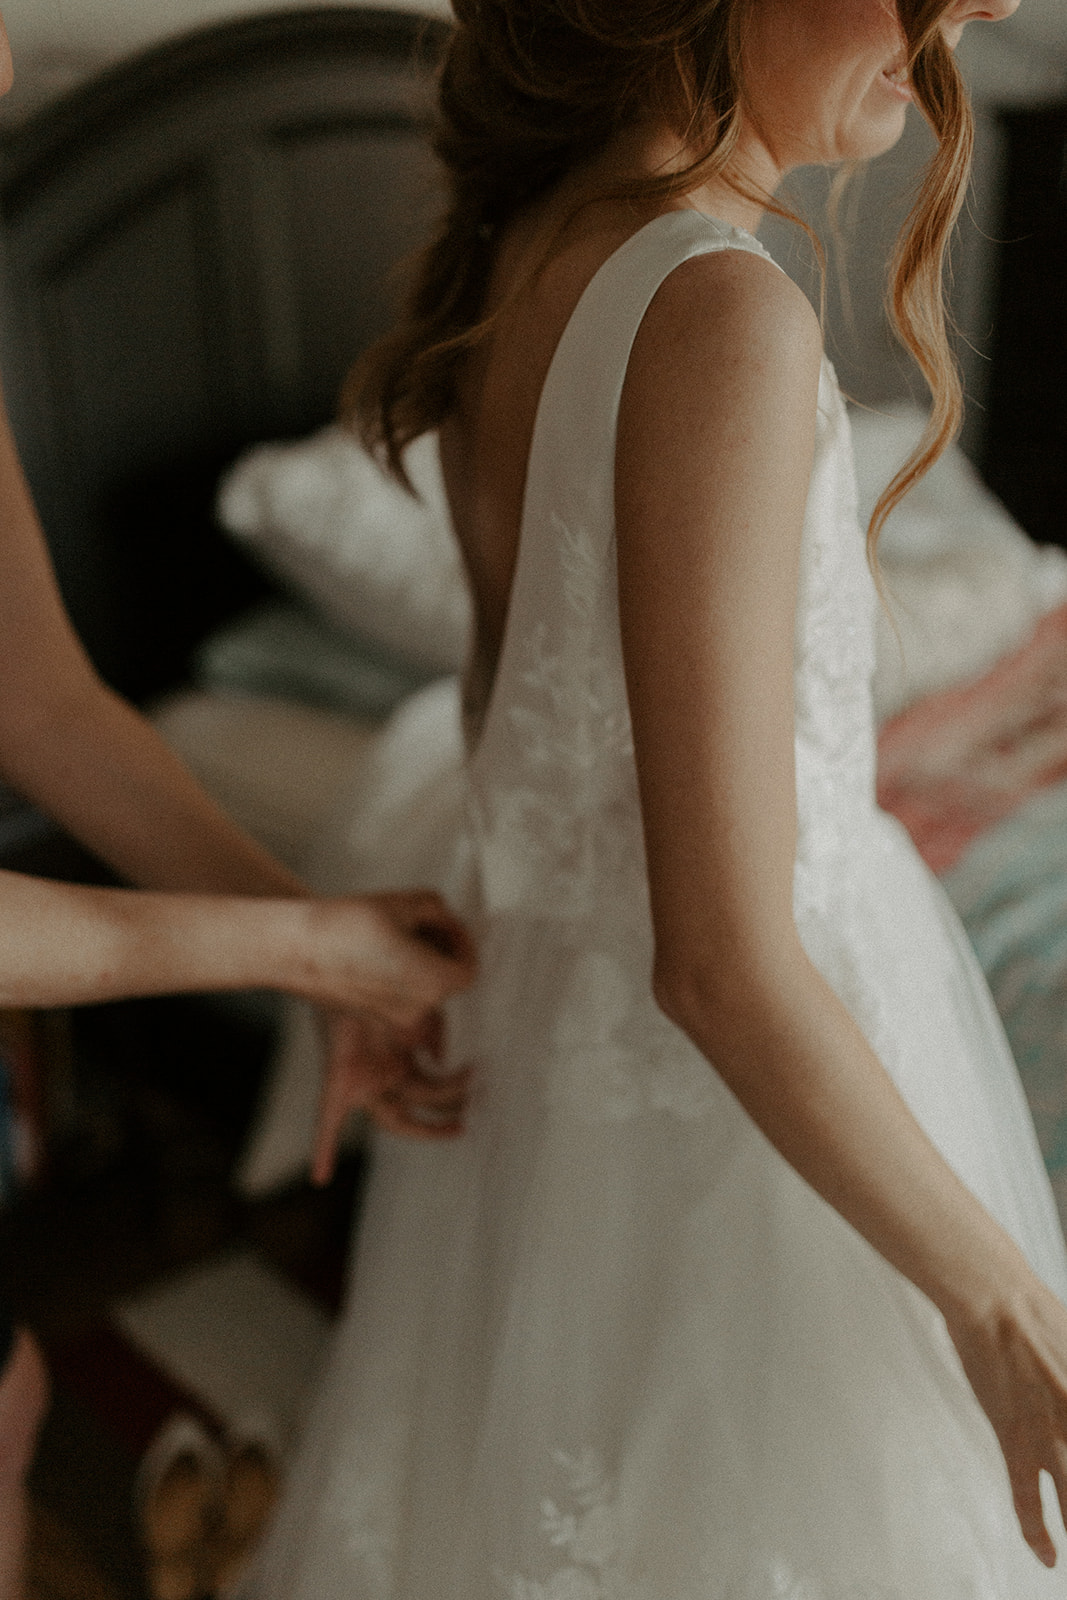 camp_wokanda_peoria_illinois_wedding_photographer_wright_photographs_bliese_0065_websize.jpg